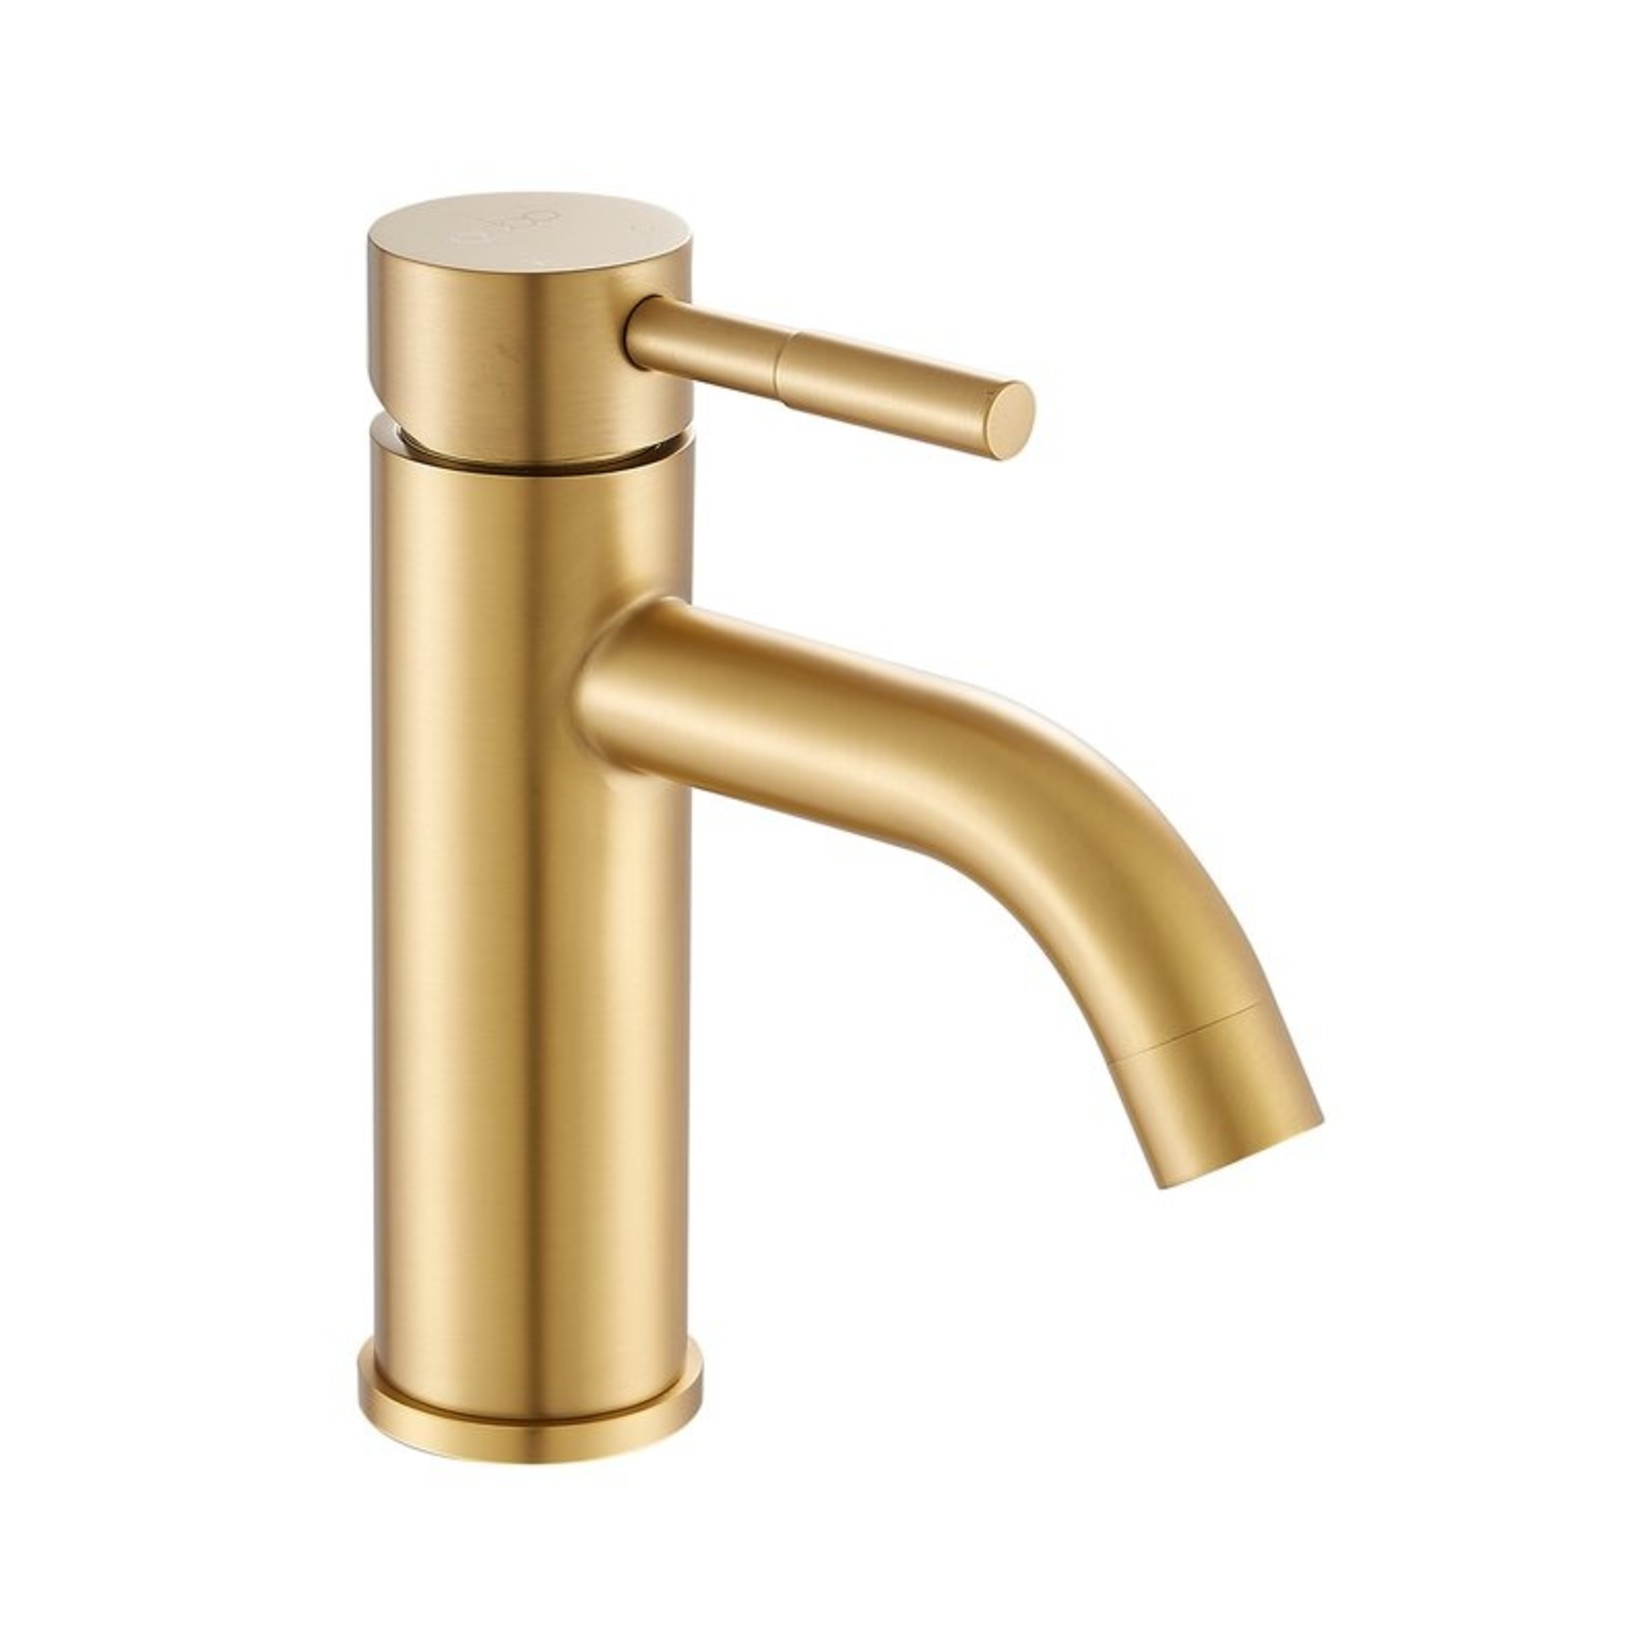 Brushed brass faucet sink NRD-981005-BB